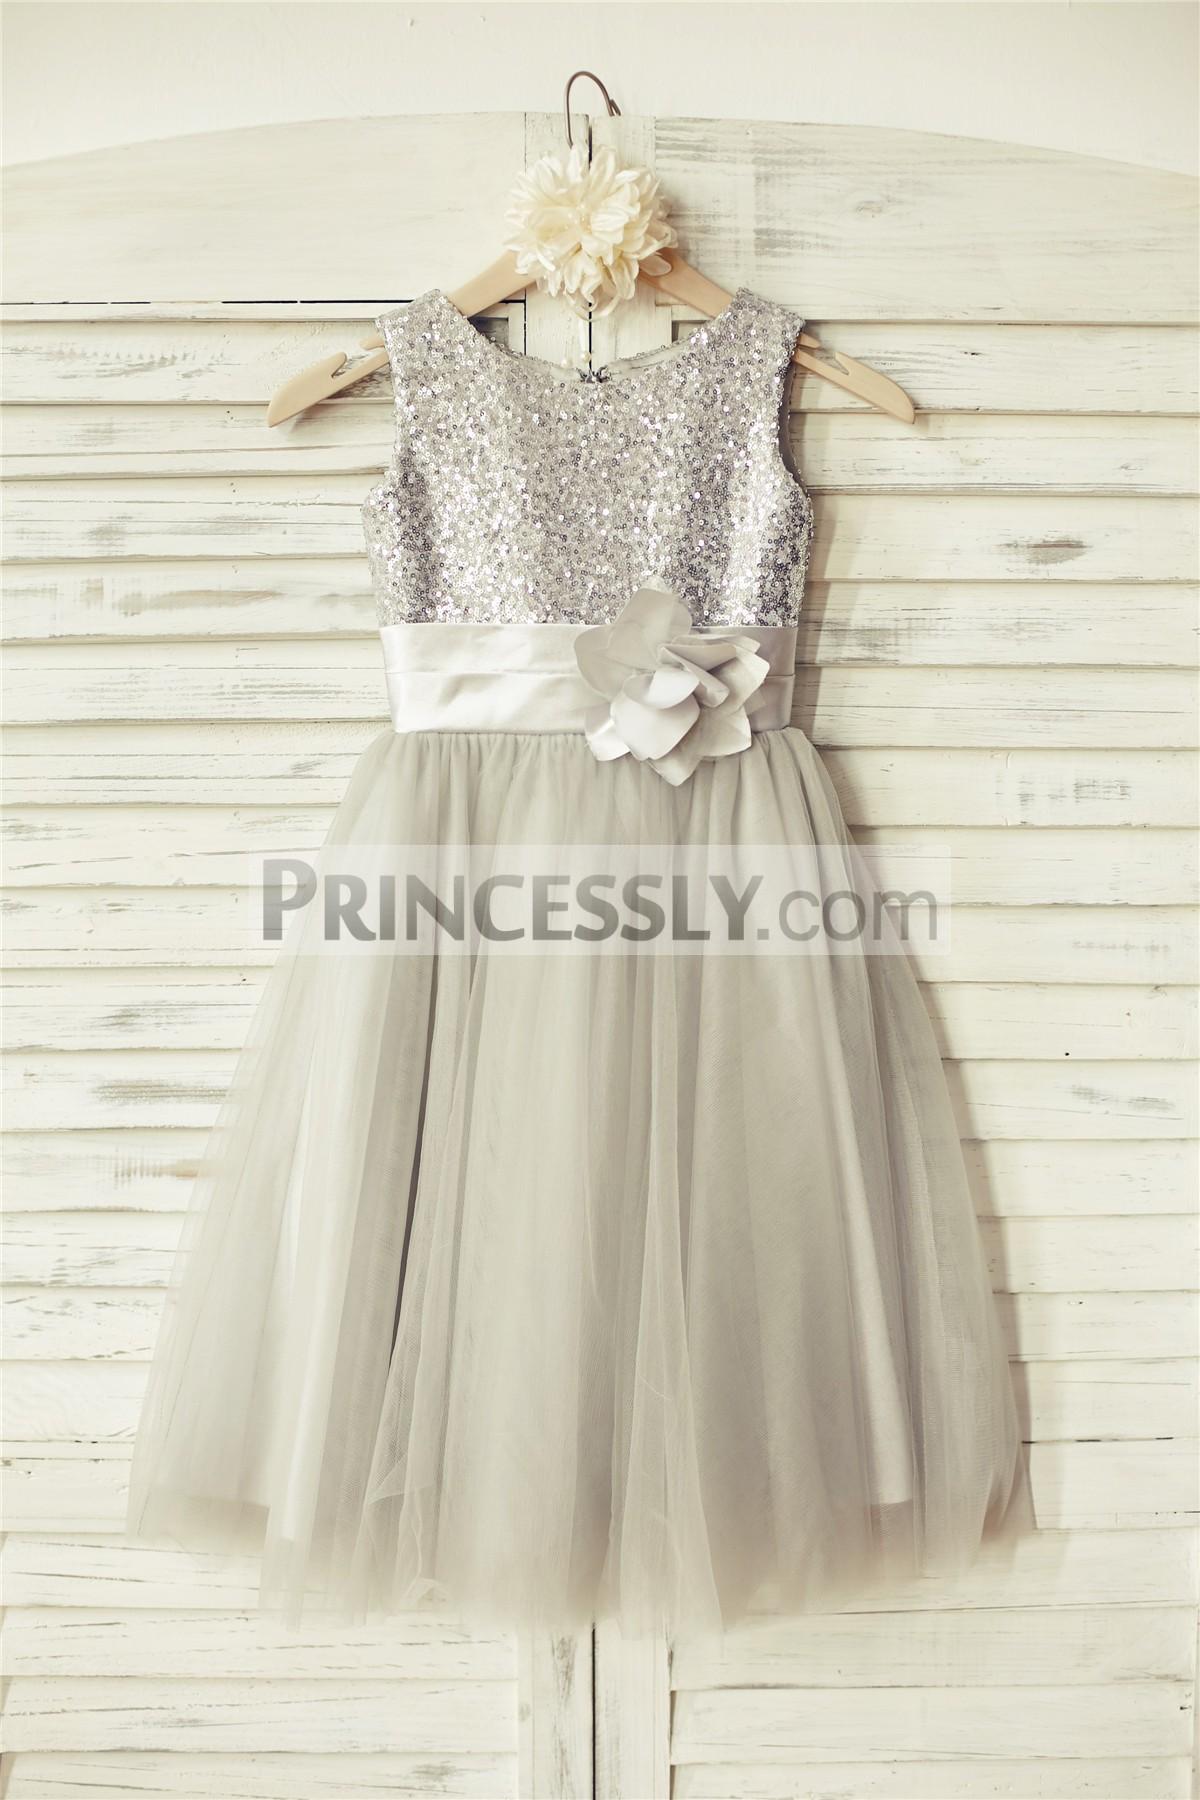 Silver sequins tulle flower girl dress with satin belt